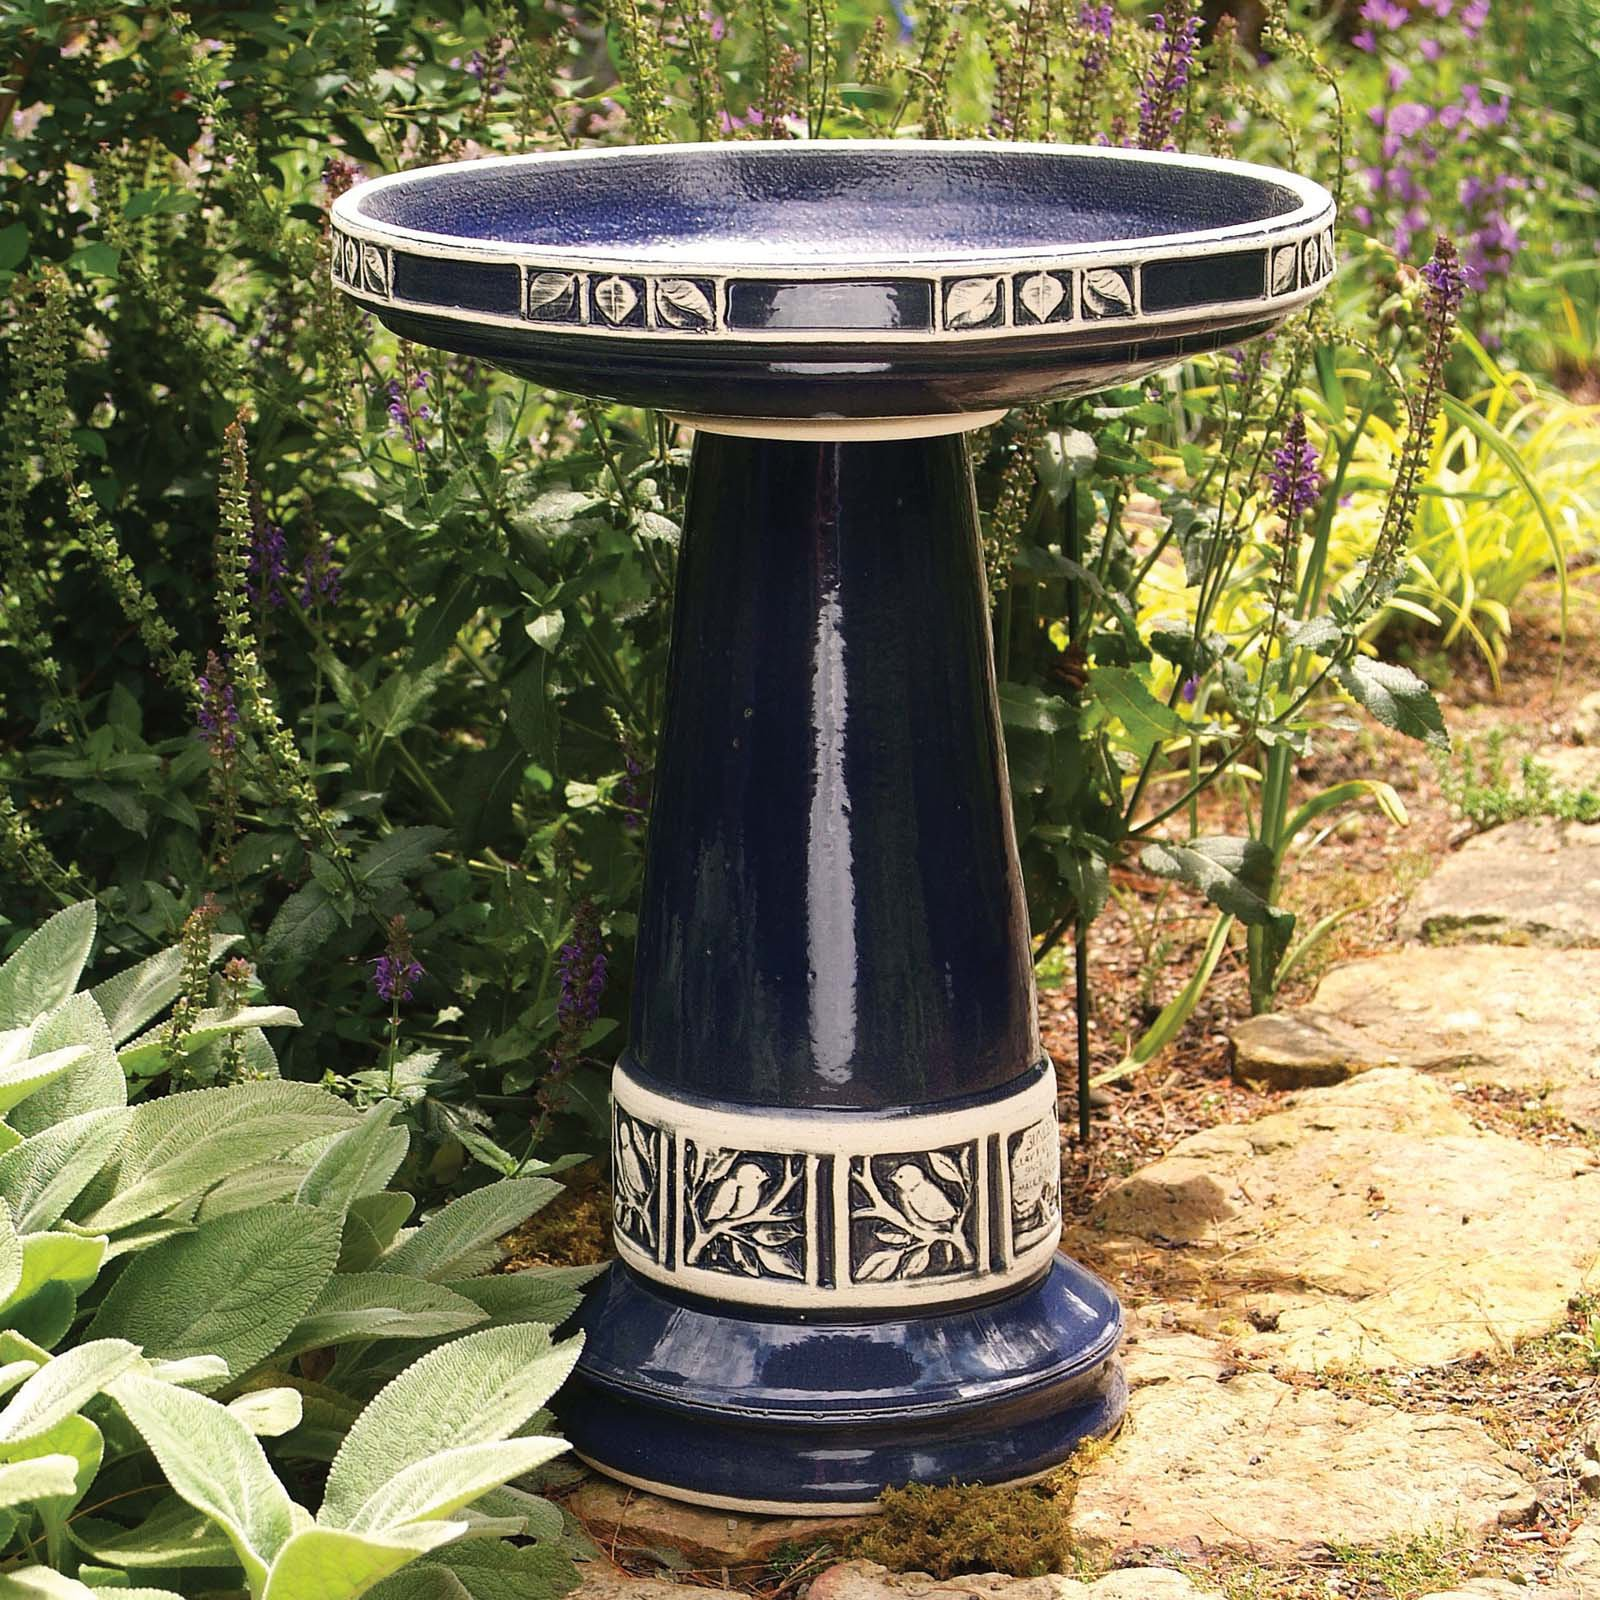 Burley Clay Zanesville Glazed Cobalt Blue Ceramic Bird Bath